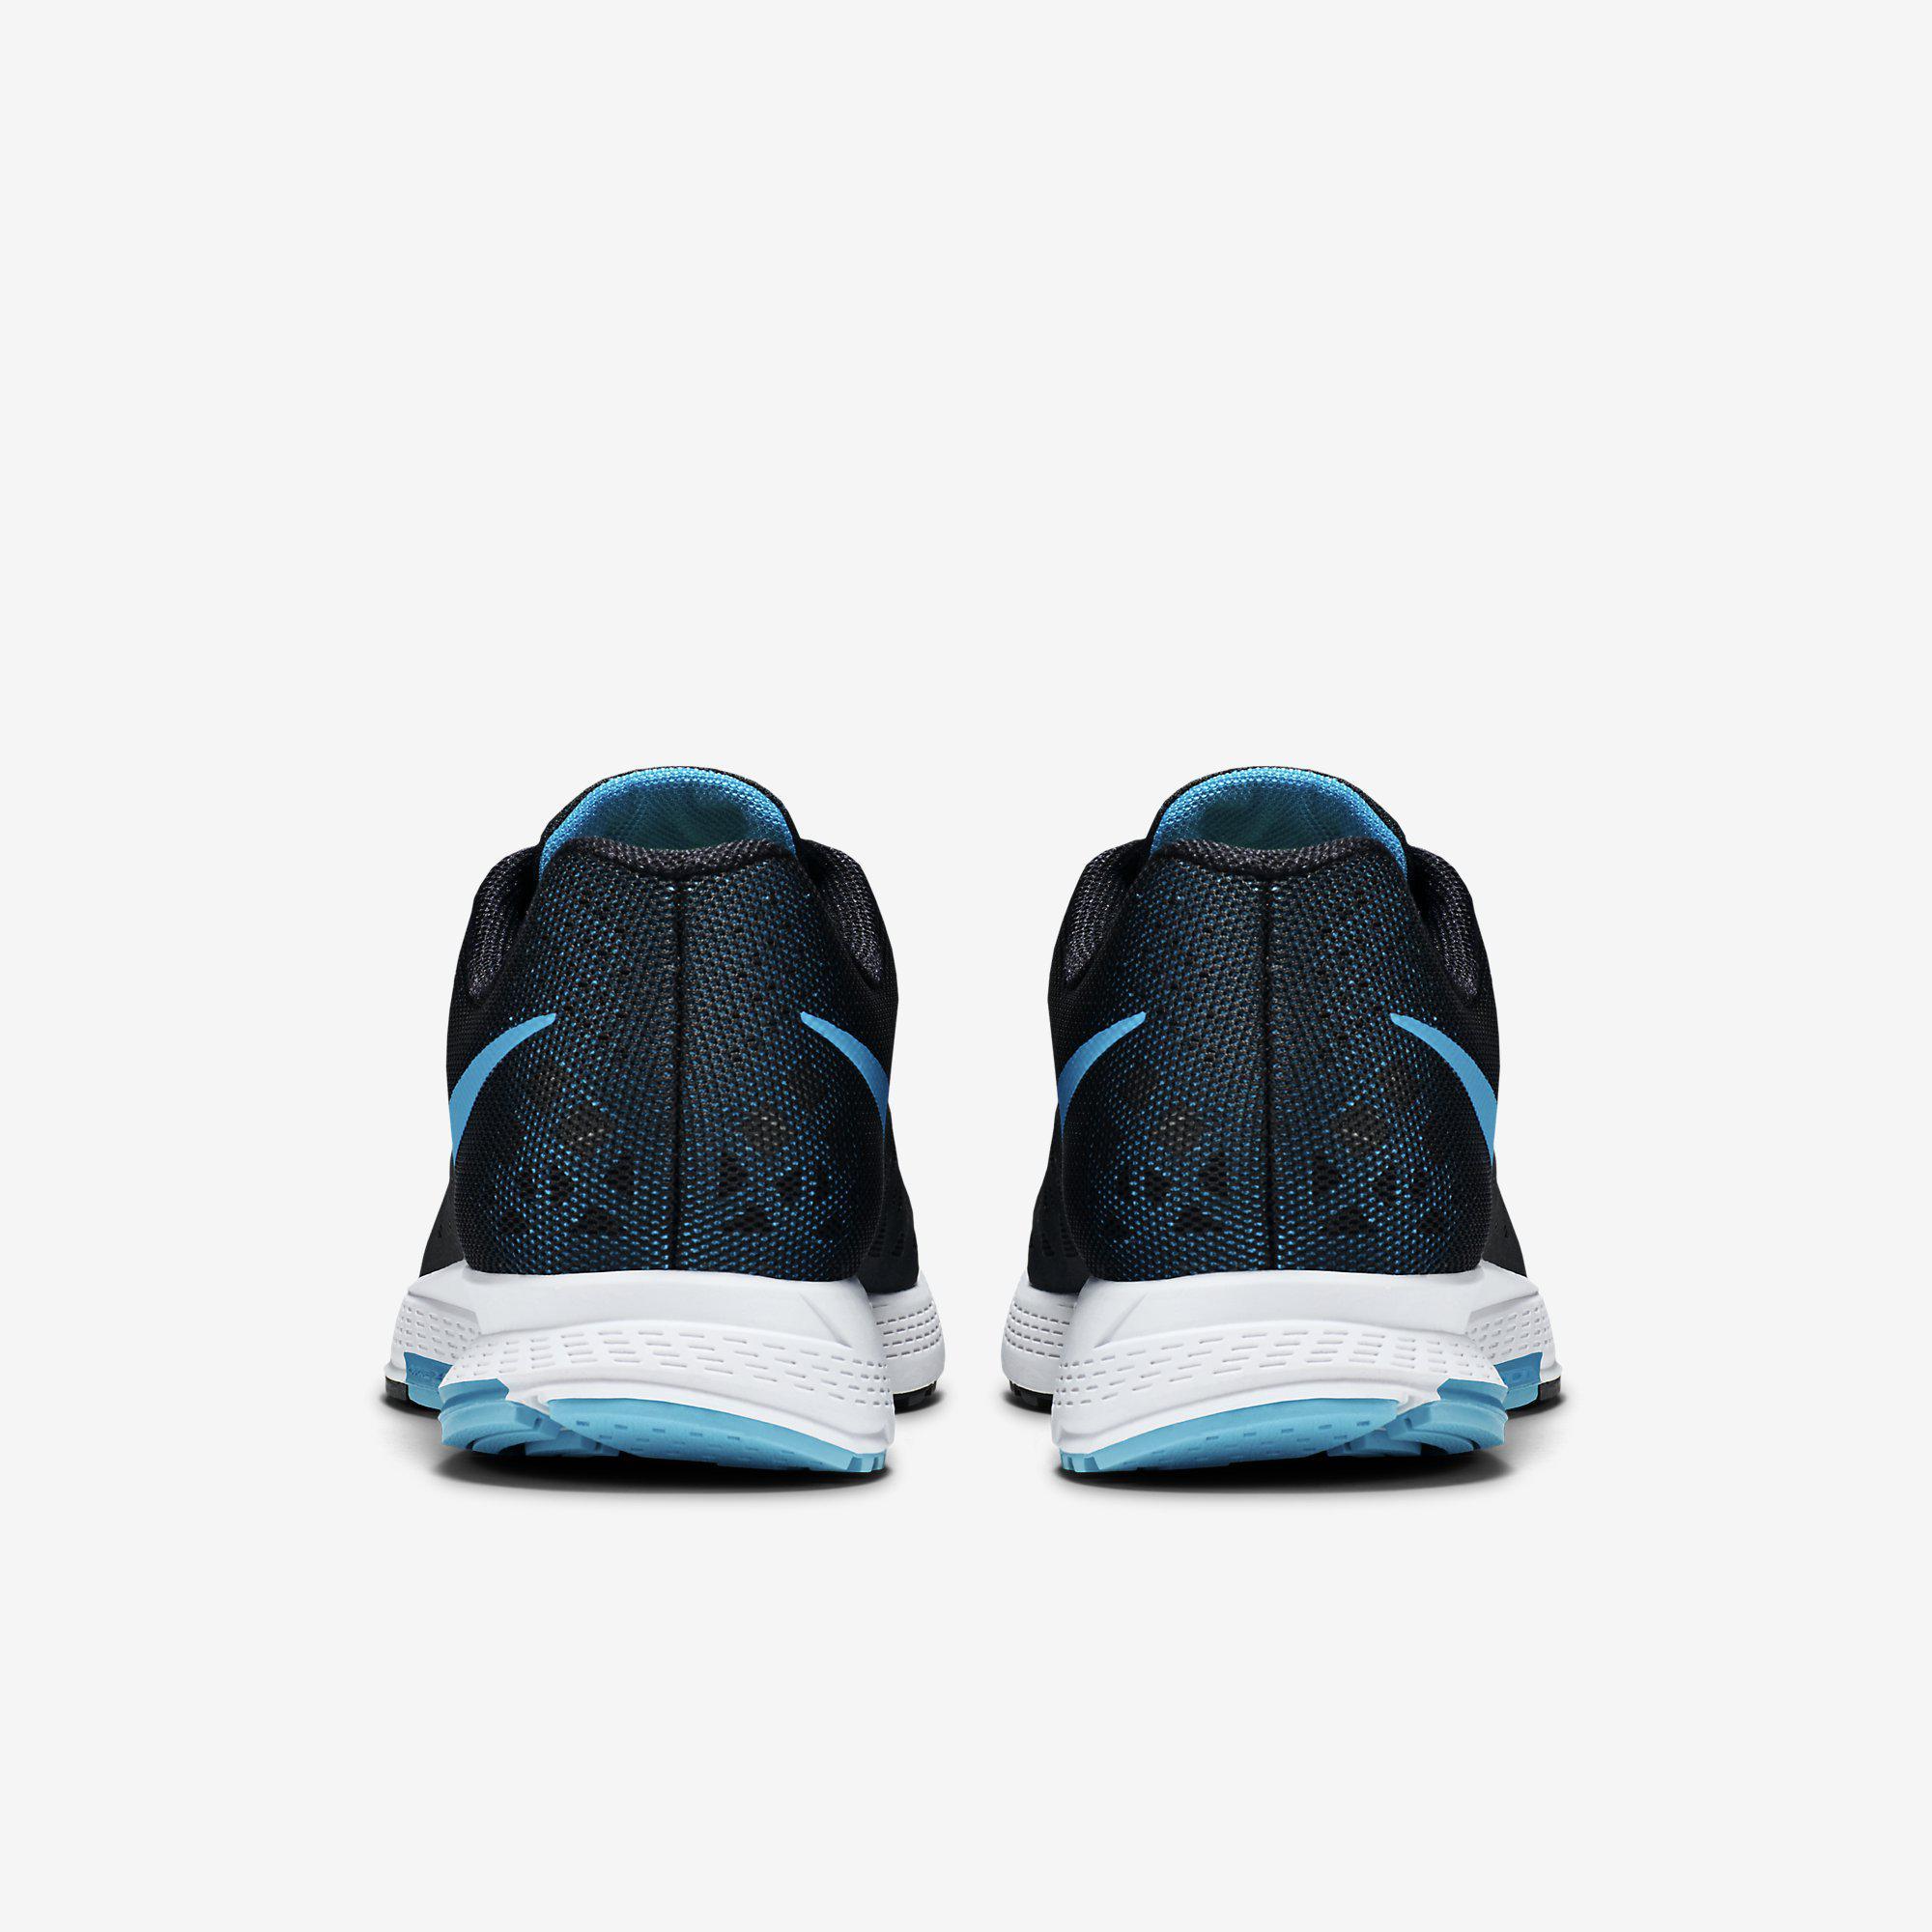 the latest 55834 83830 Nike Mens Air Zoom Pegasus+31 Running Shoes - Black White Blue